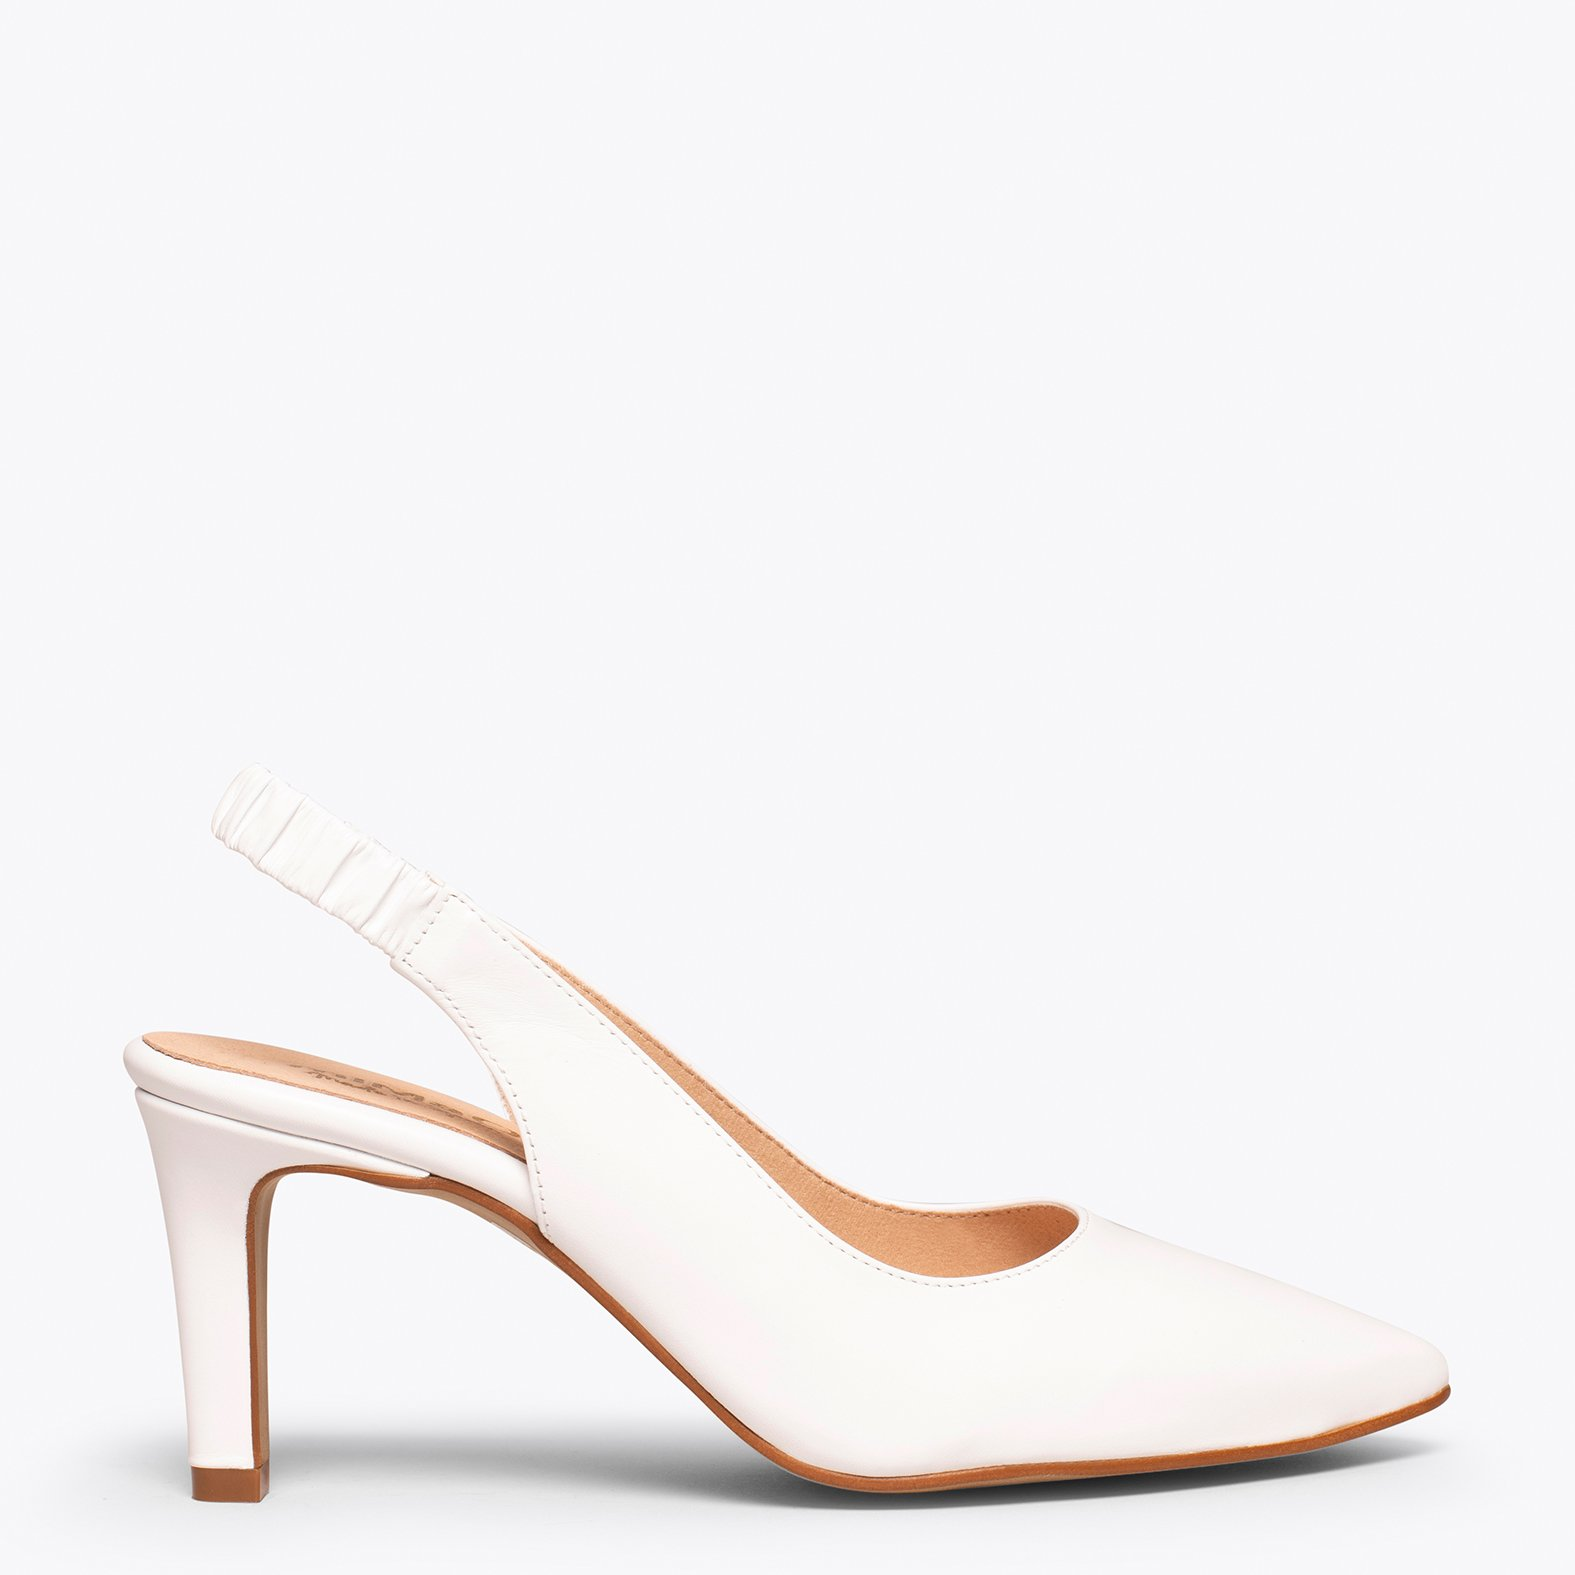 COCKTAIL Zapato destalonado BLANCO